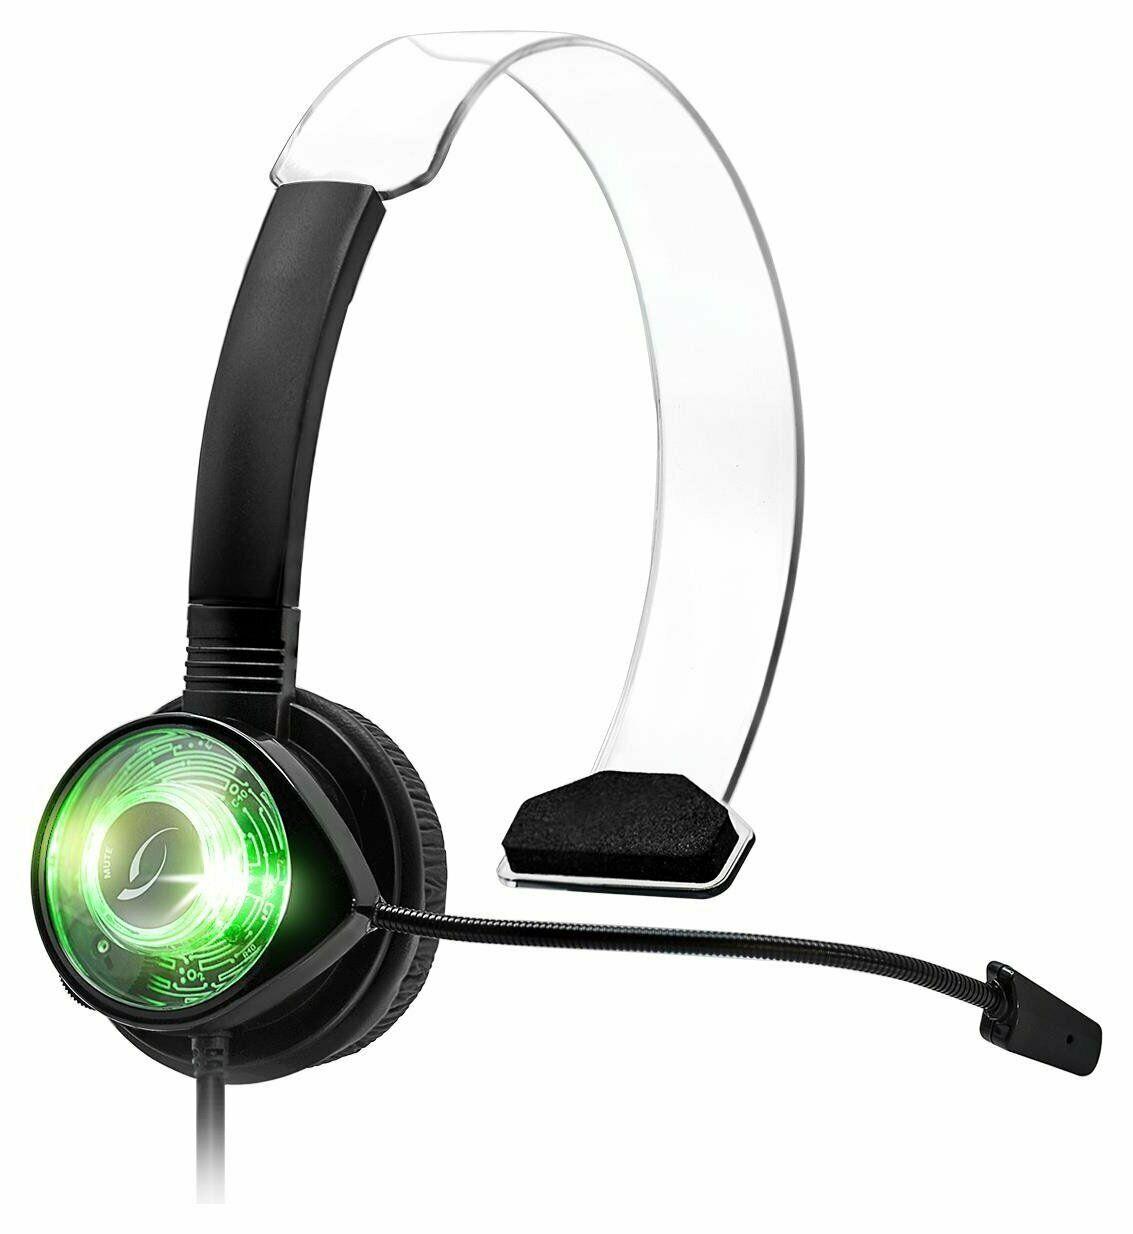 Afterglow Mono Communicator Microsoft Xbox 360 Gaming Headset £3.99 (UK Mainland) at Argos on eBay